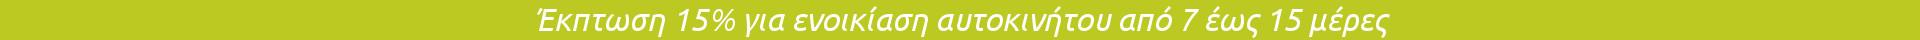 http://sotirakis.biz/wp-content/uploads/2014/05/discount_15_gr.jpg